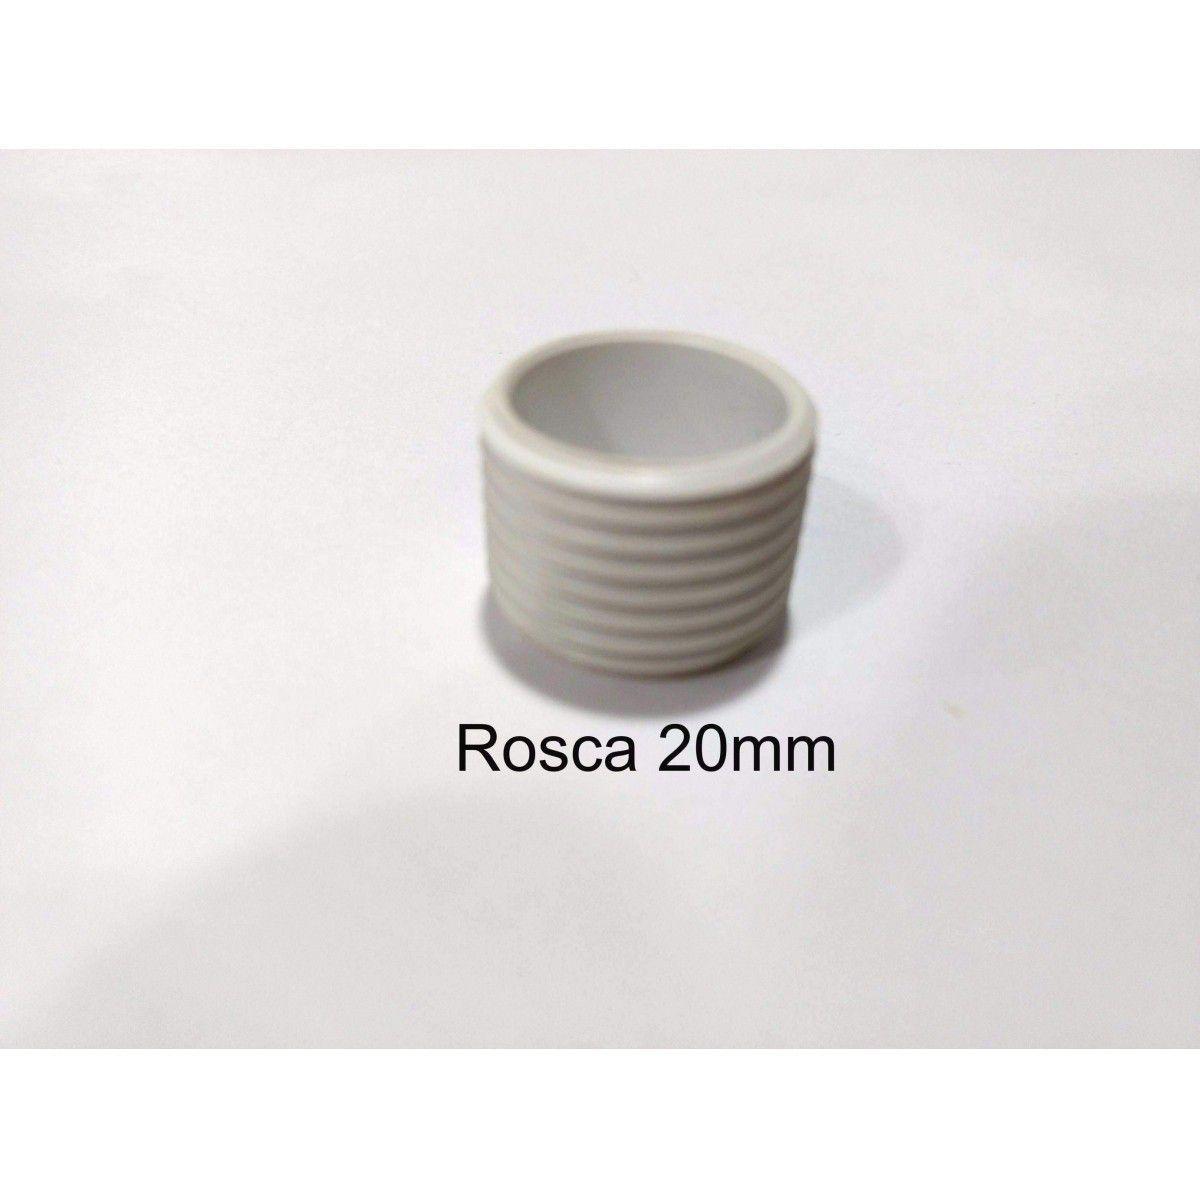 Adaptador para Led Piscina - Rosca de 20mm - Light Tech